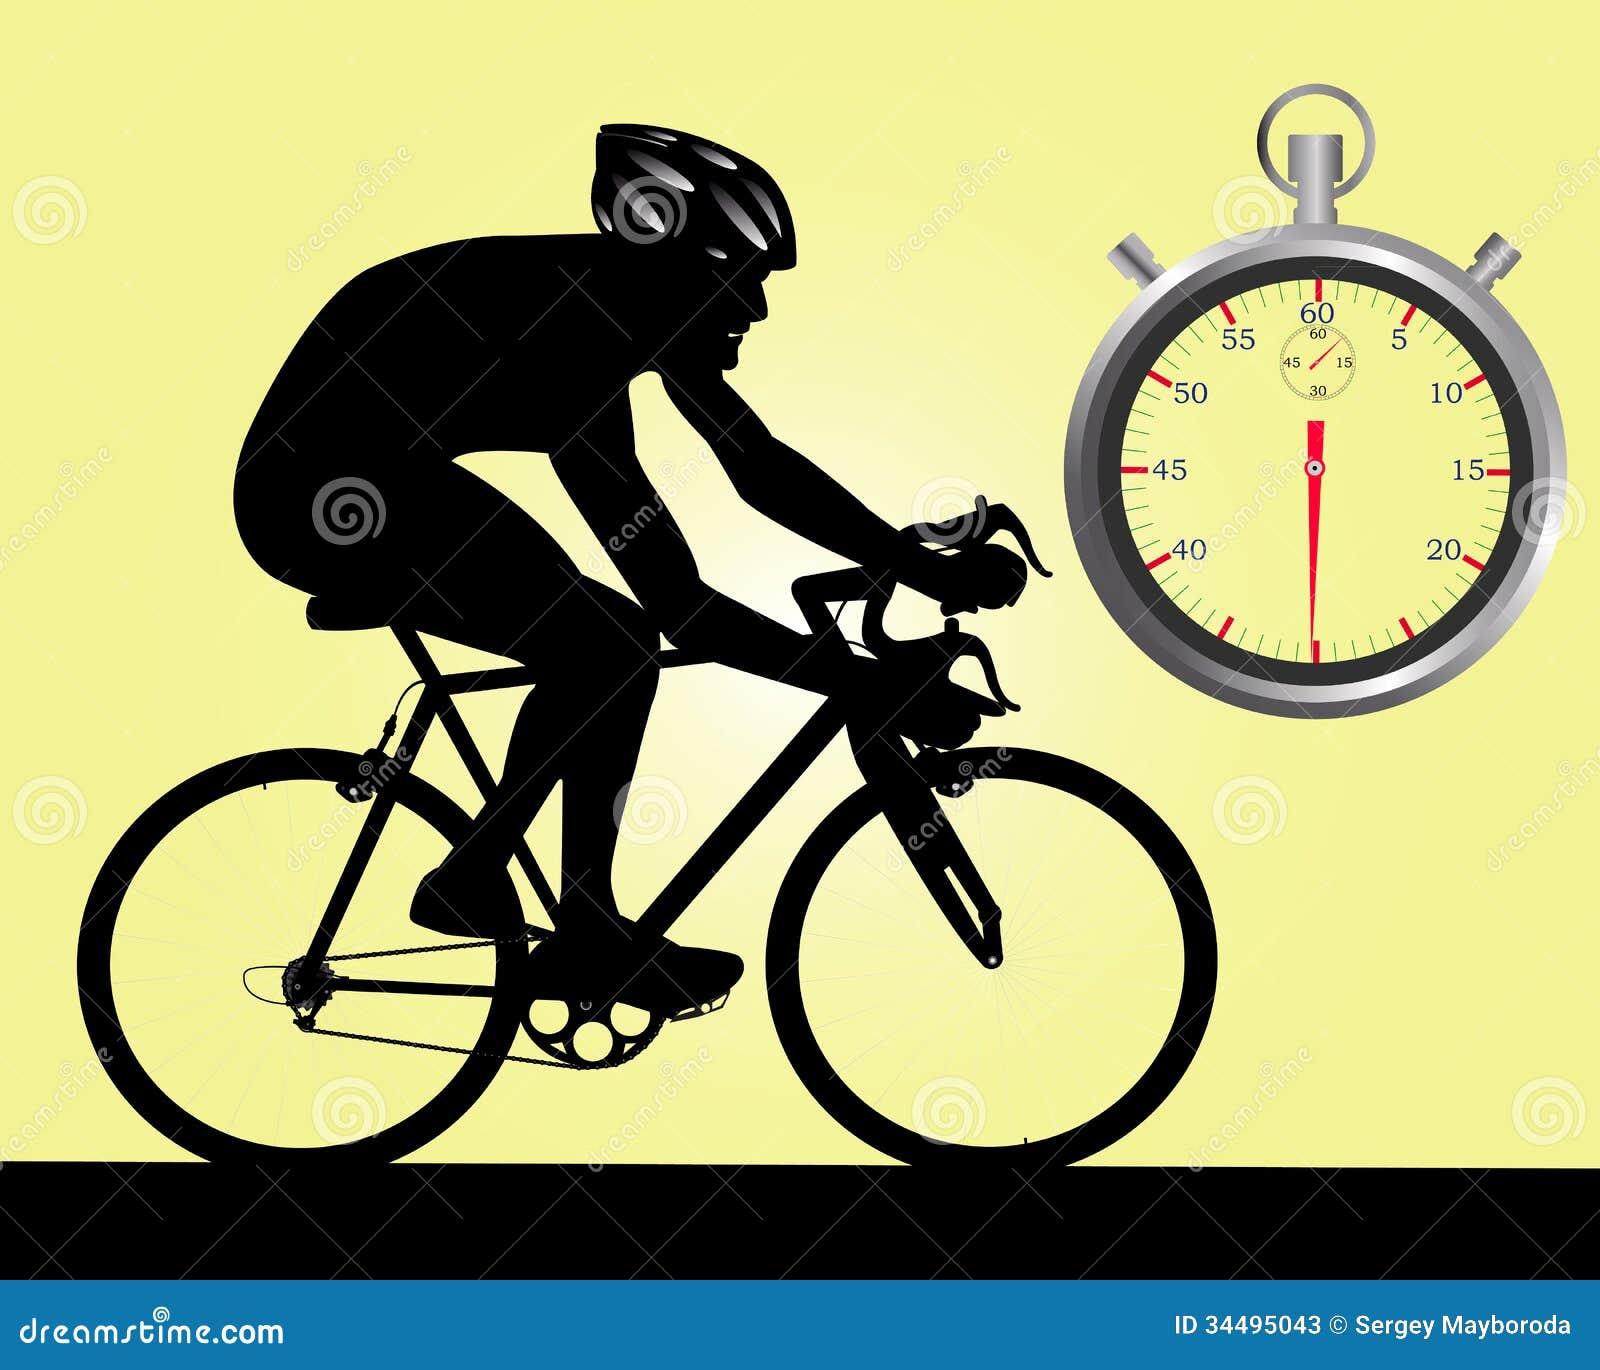 racing the clock clip art video - photo #29